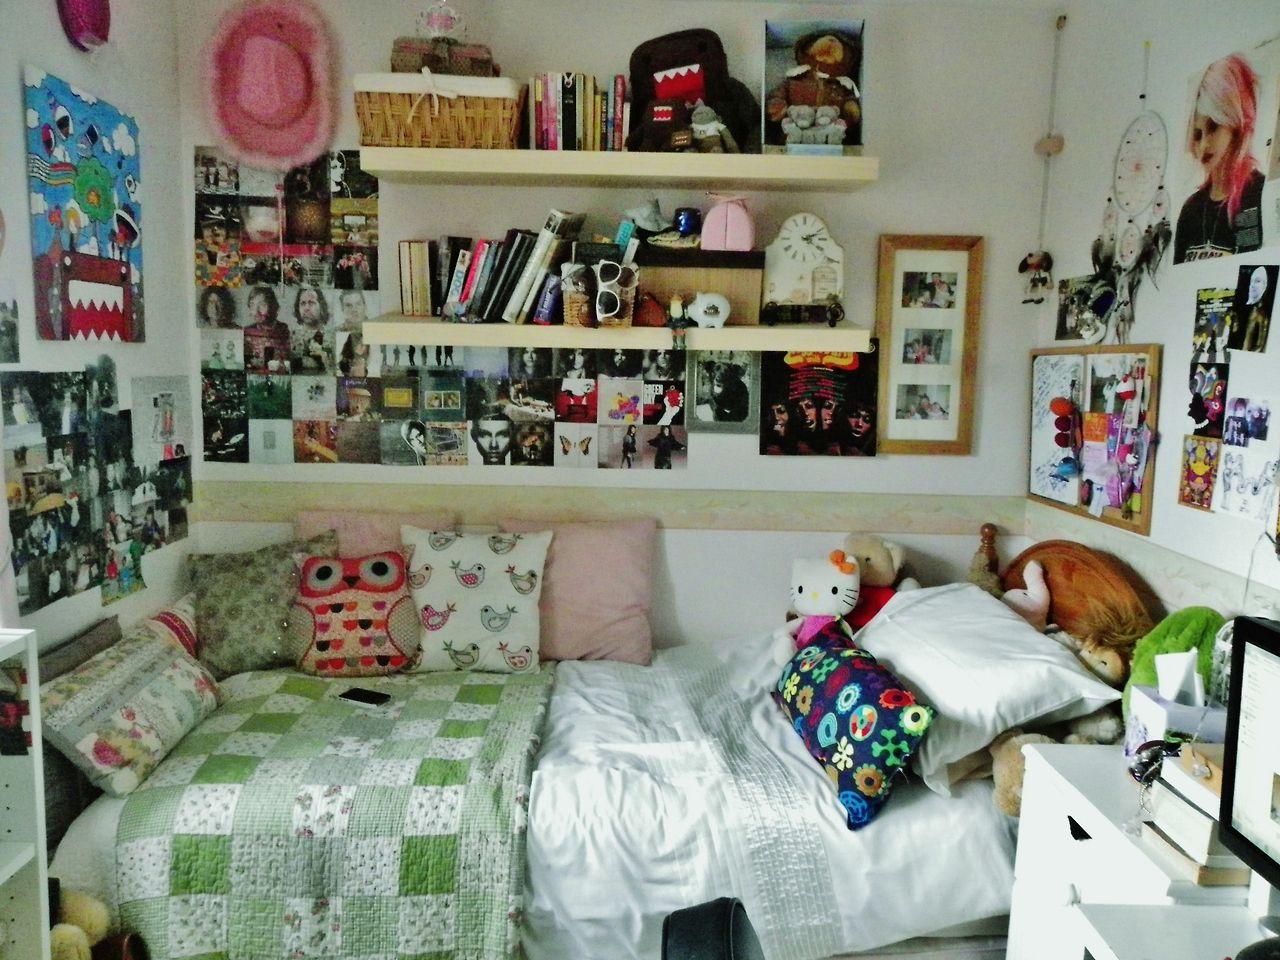 Wall decor for teen bedroom roomspiration  ideas room  pinterest  bedrooms roomspiration and